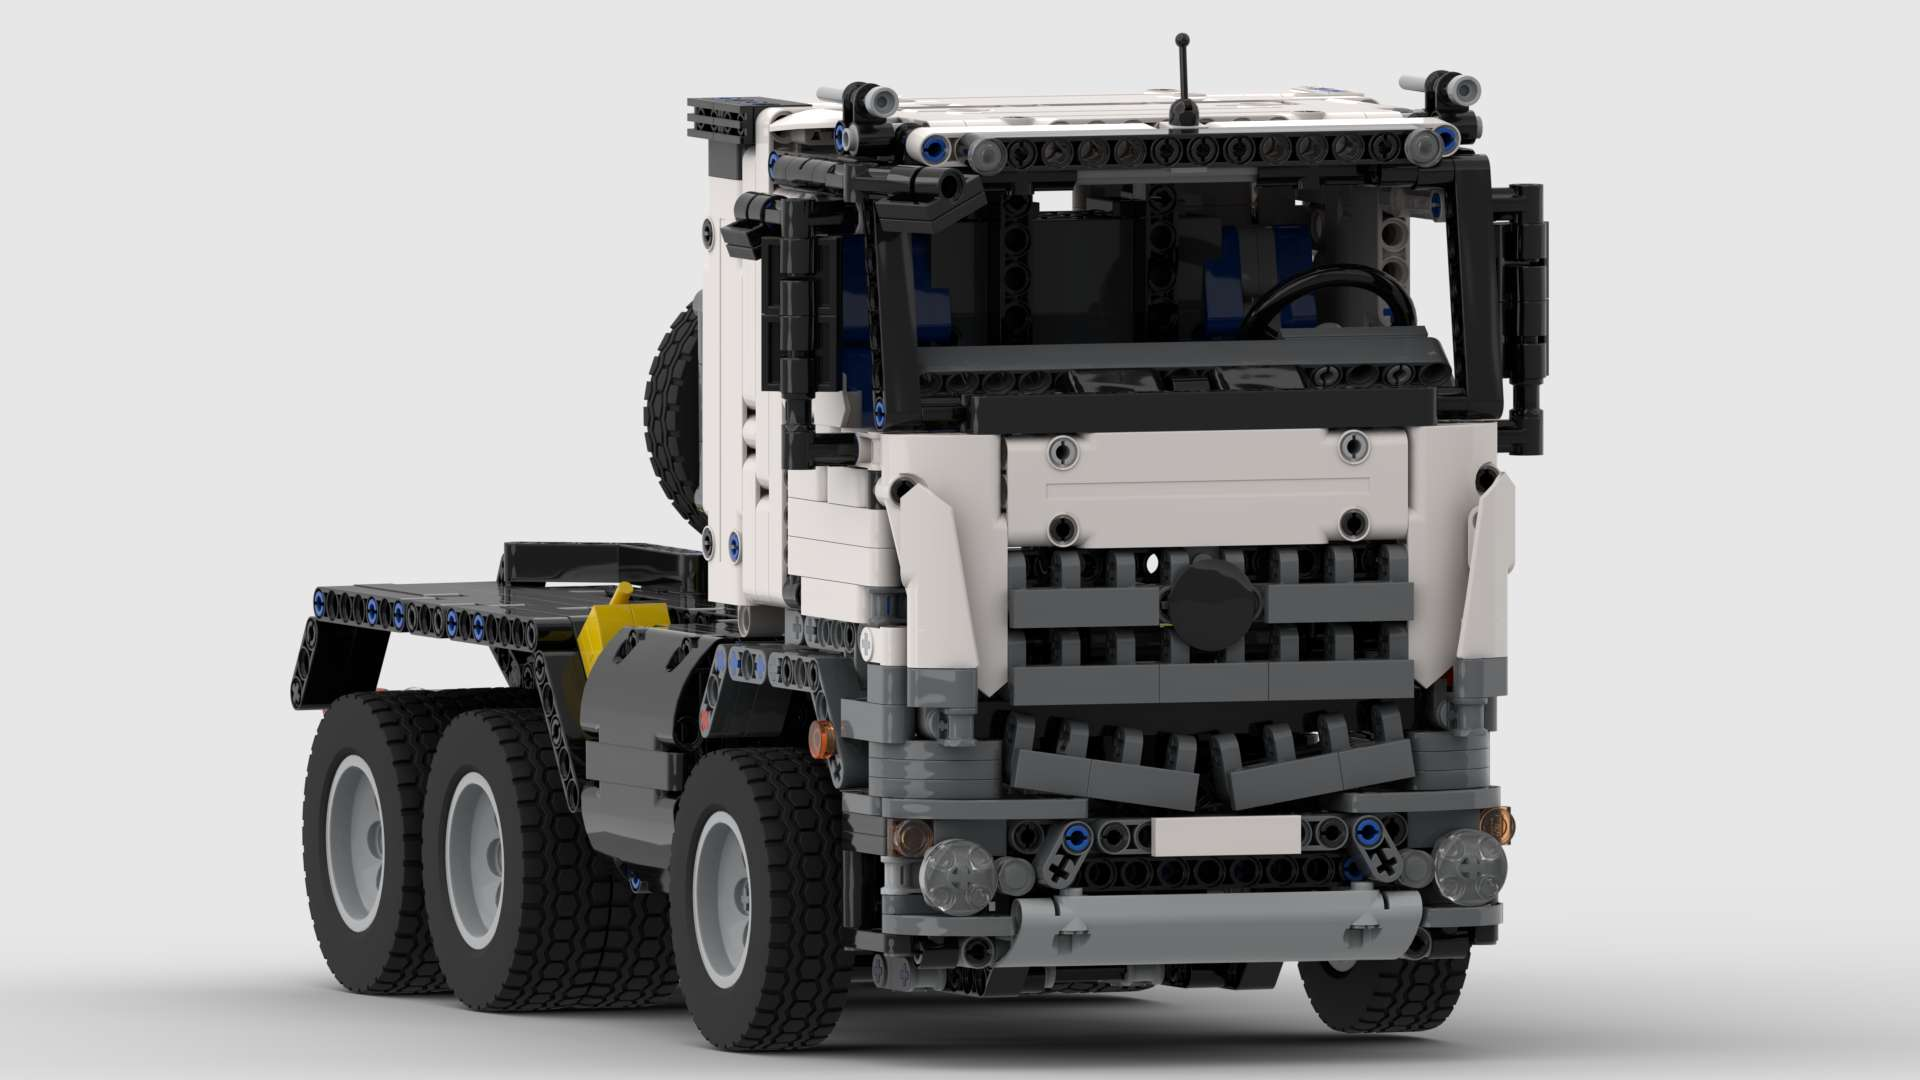 http://mistercreator.de/produkt/lego-42043-mercedes-arocs-rc-sattelschlepper/